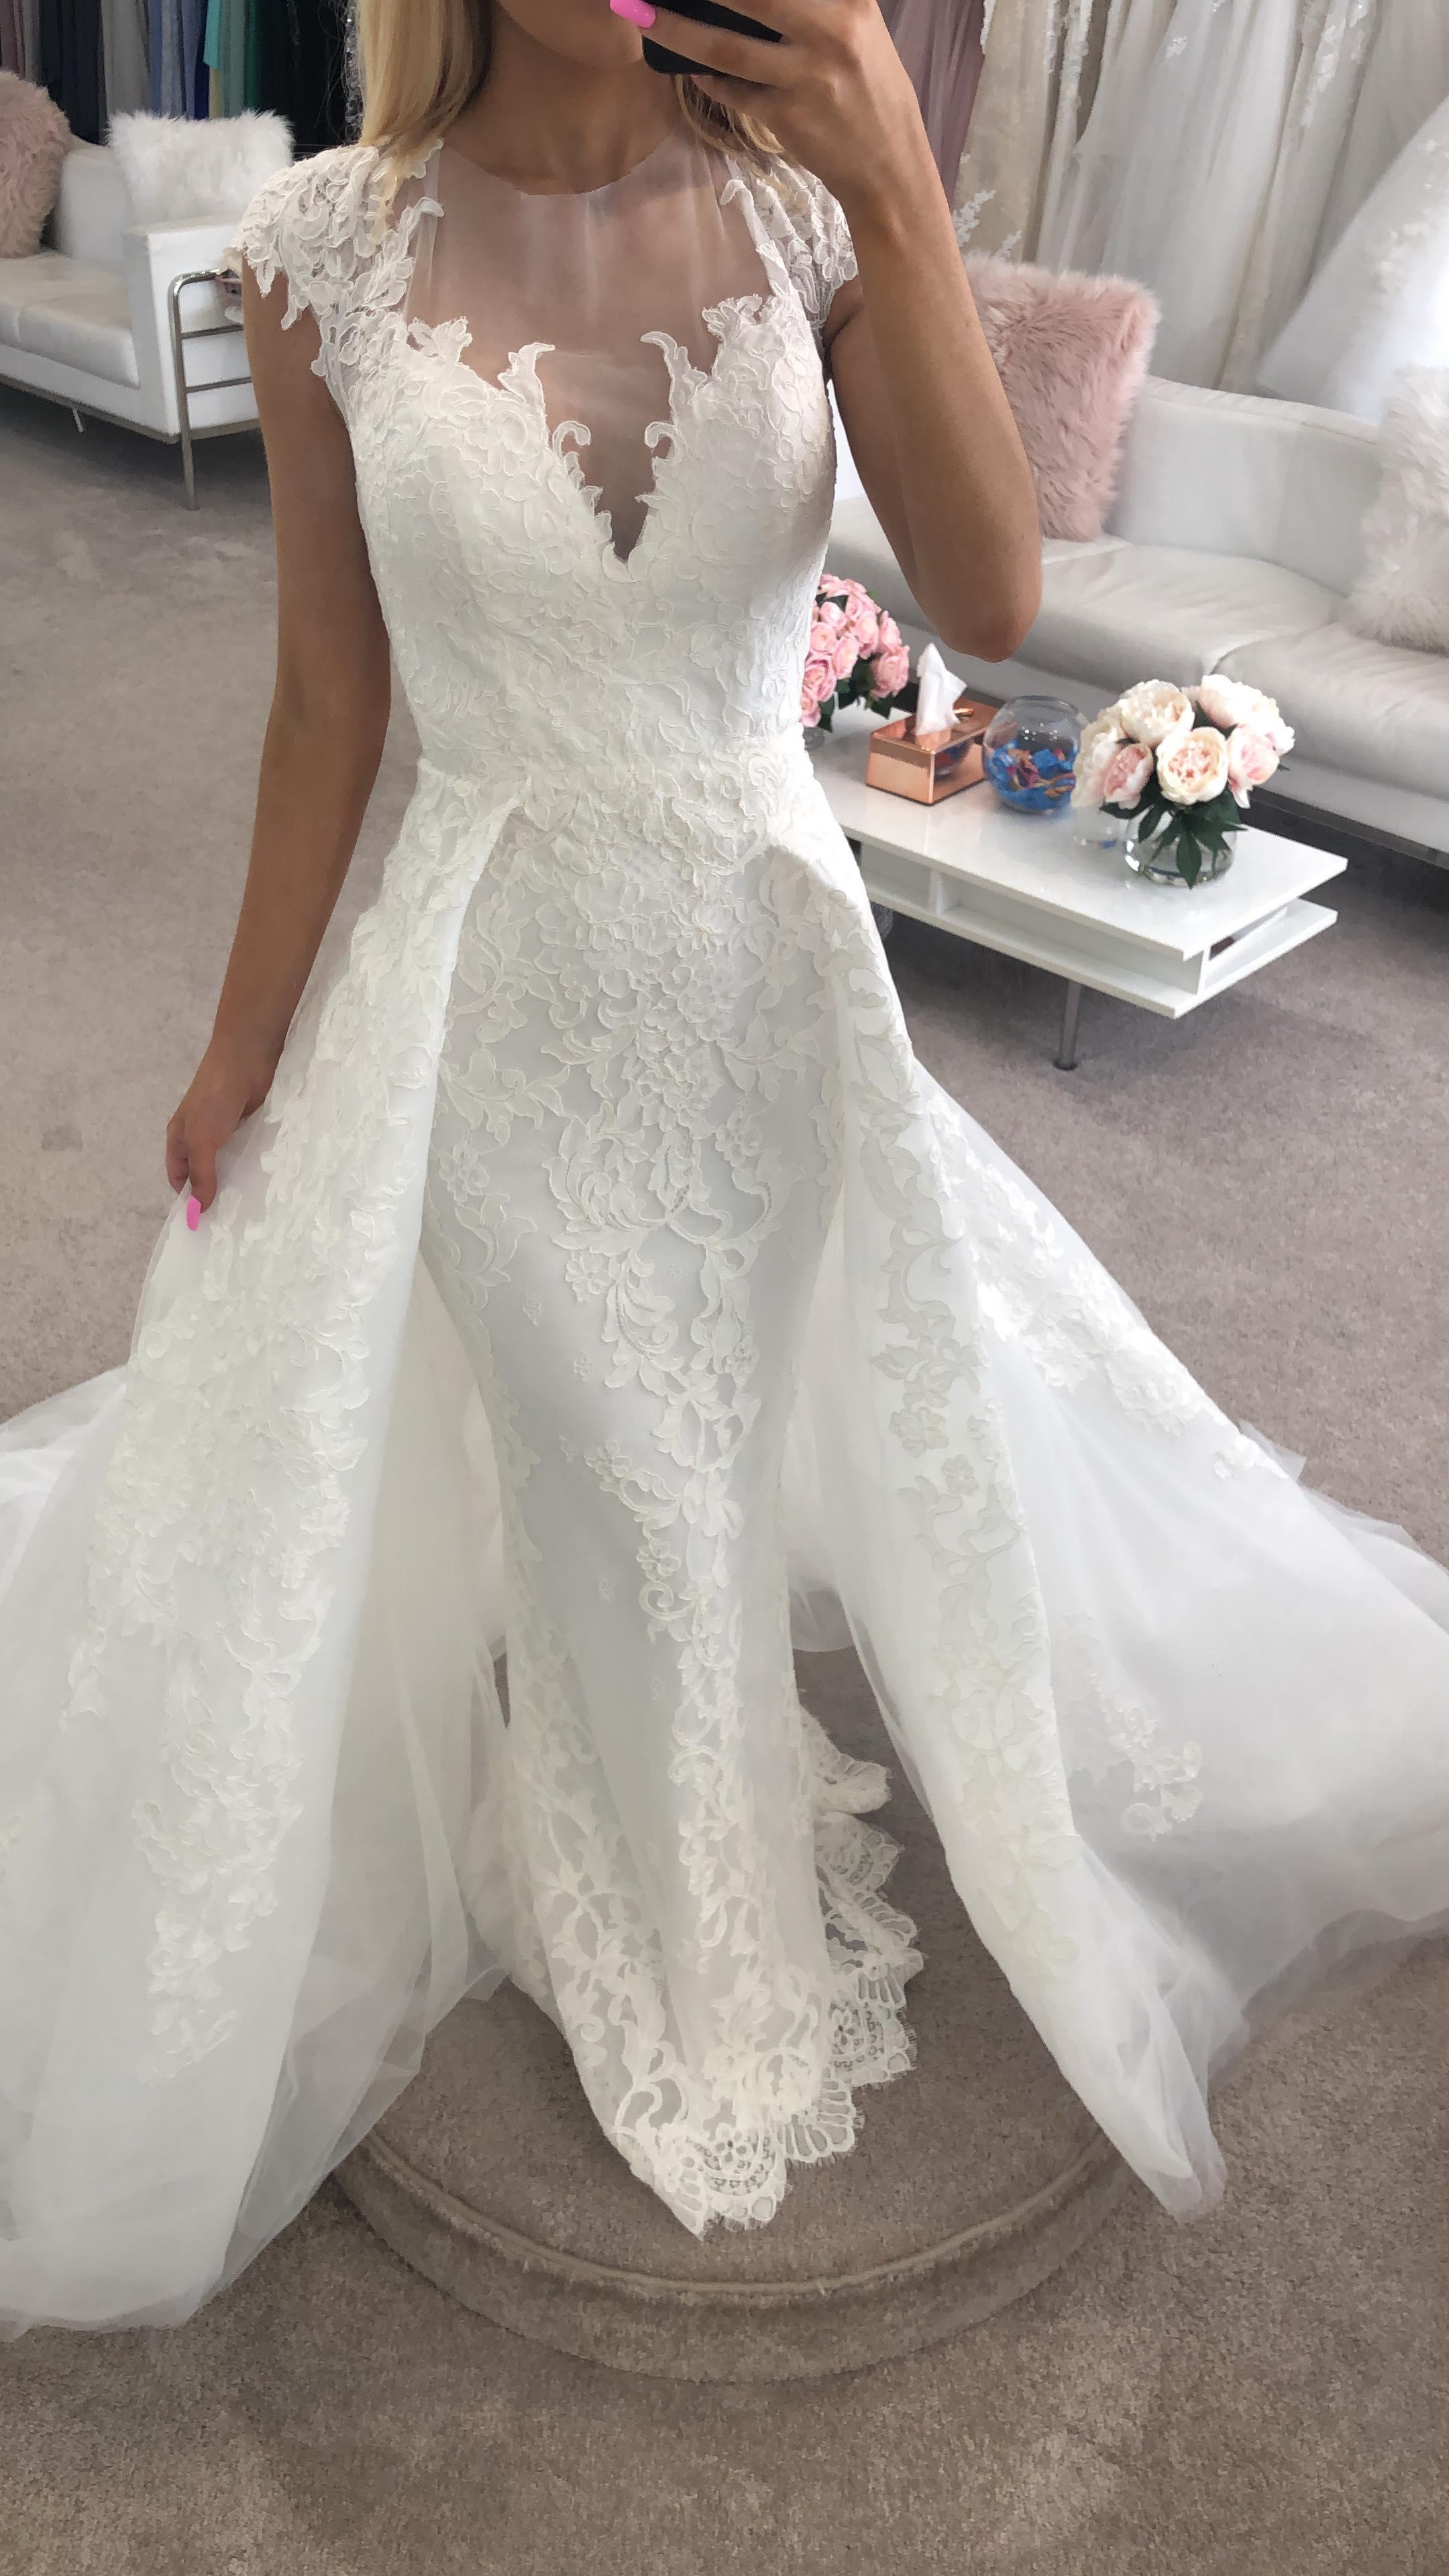 Alison 18130 Calla Blanche Wedding Dresses Online Australia Bridal Overlay Skirt Sydney Melbourne Adelaide Perth Brisbane Canberra